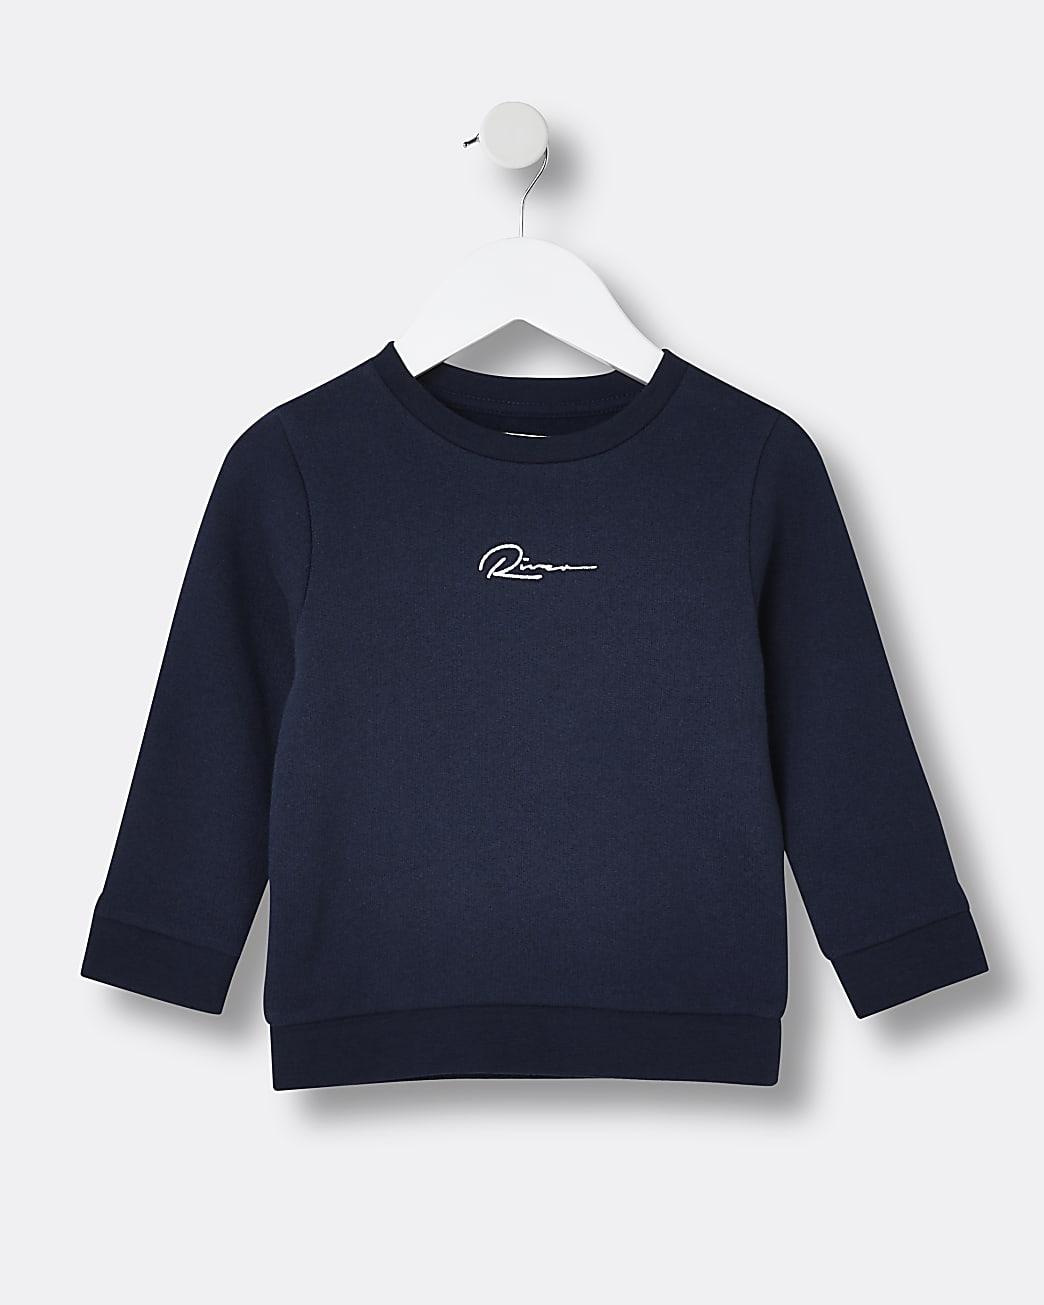 Mini boys navy River sweatshirt